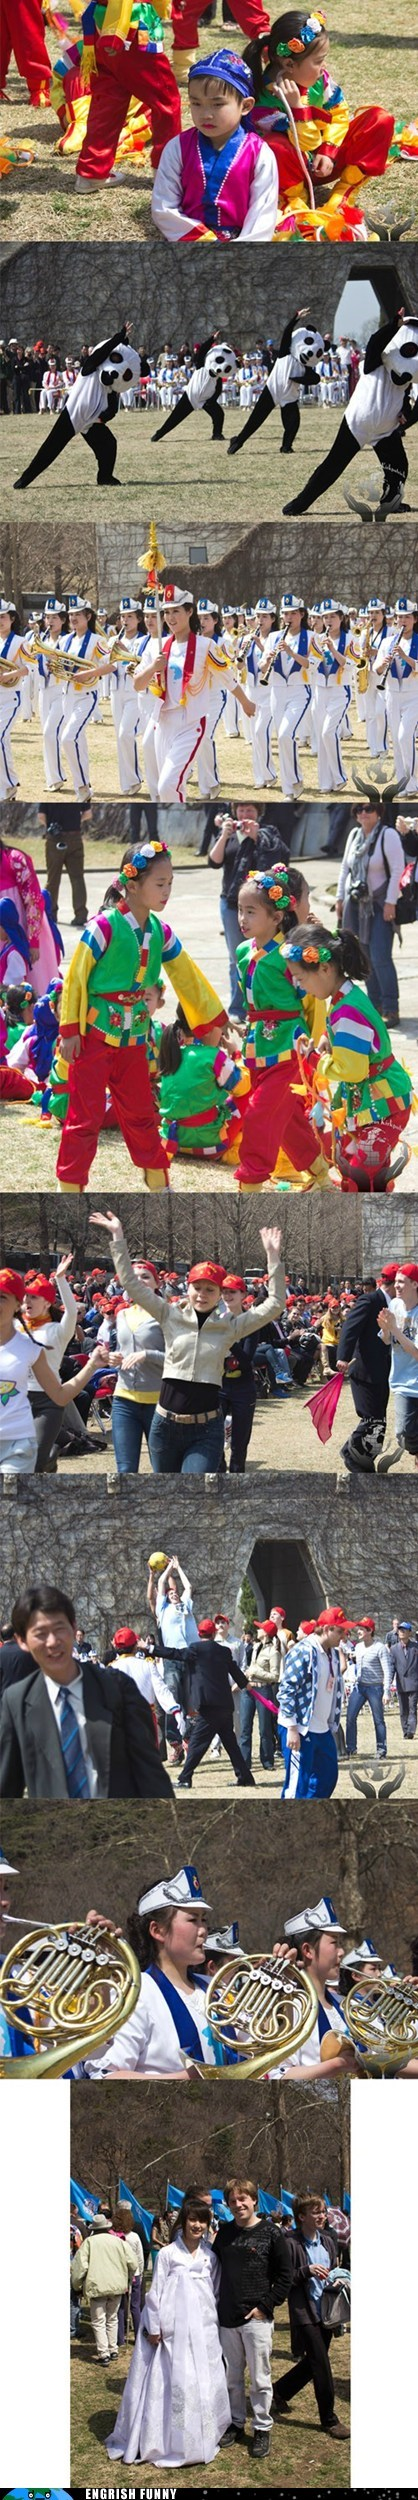 dprk,kim jong-un,North Korea,Pyongyang,pyongyang friendship fair